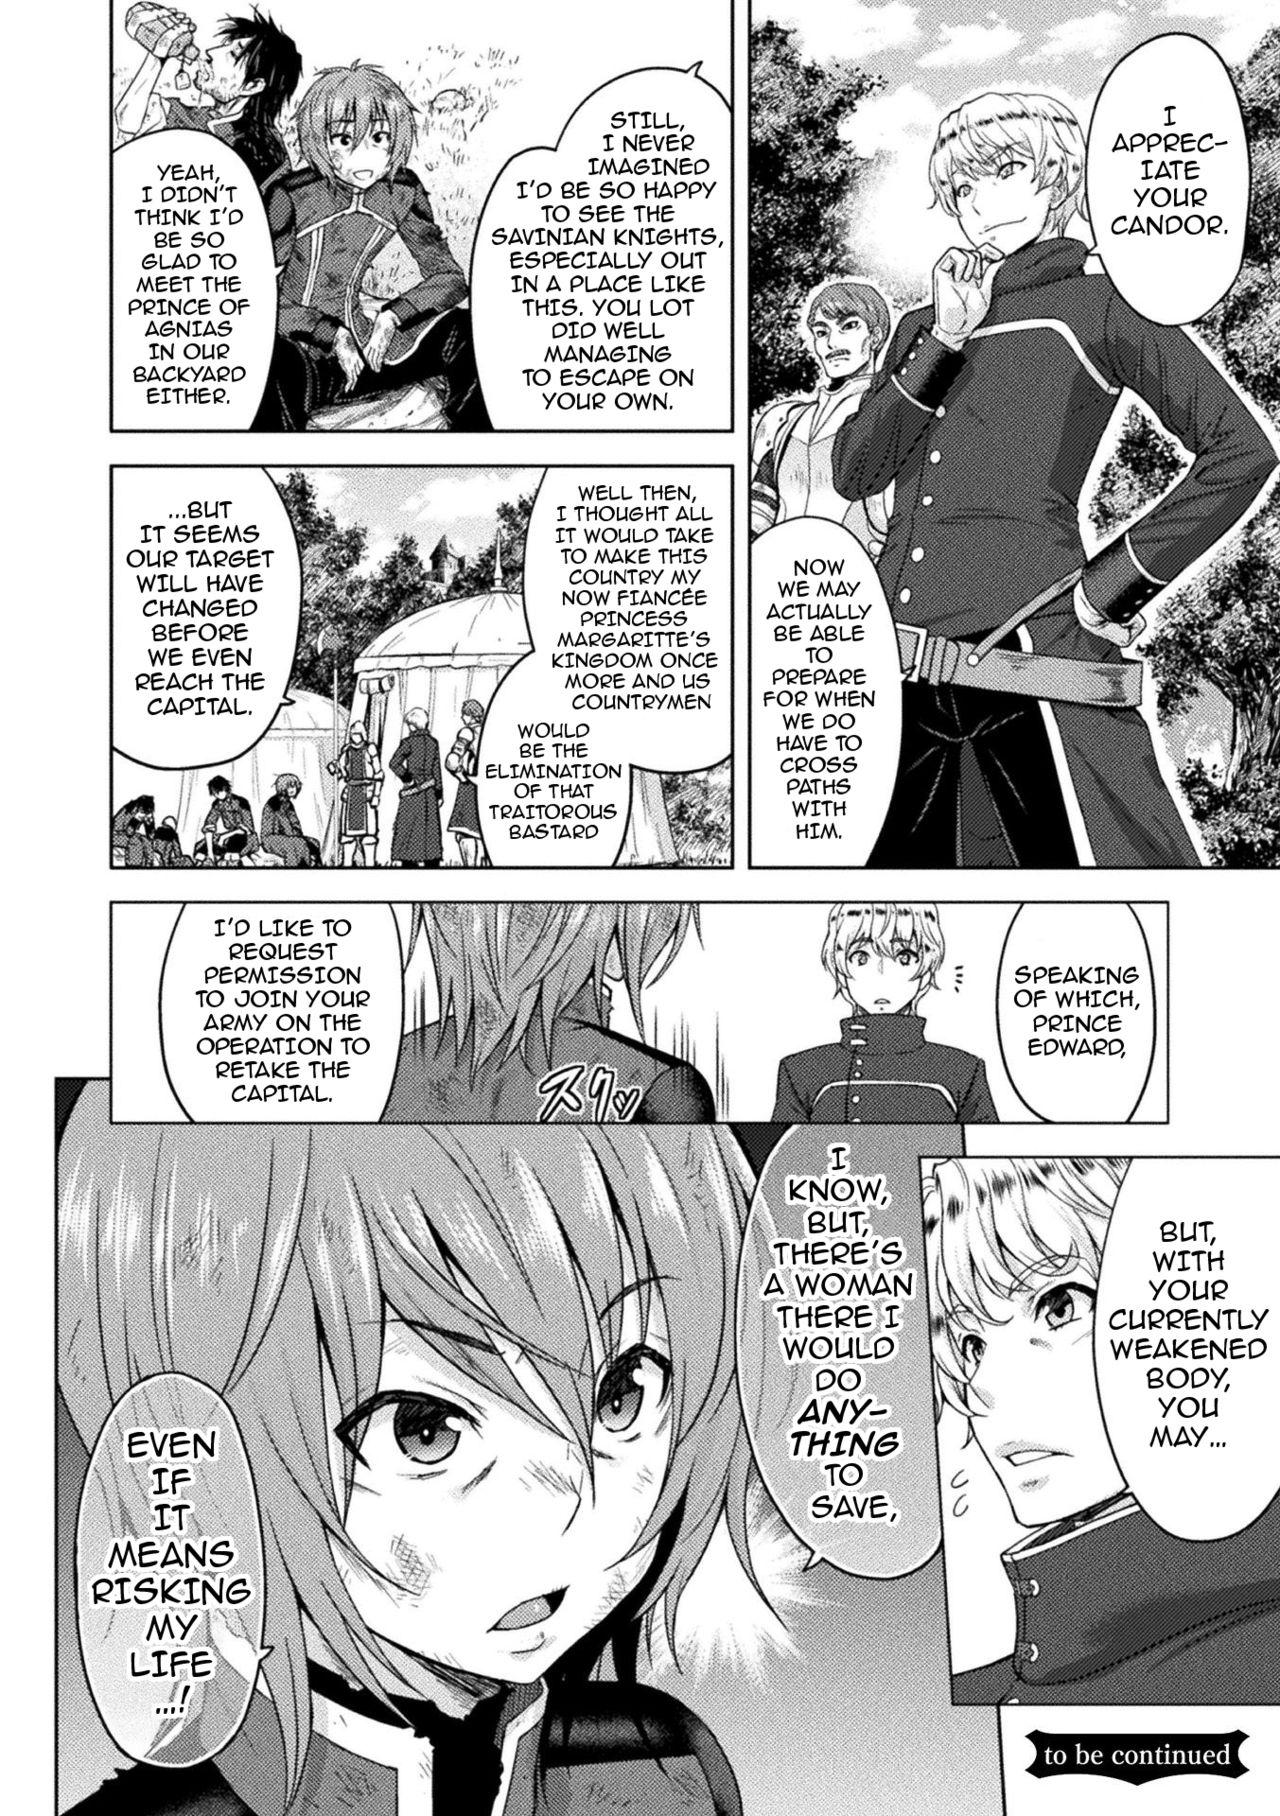 [Yamada Gogogo] Erona ~Orc no Inmon ni Okasareta Onna Kishi no Matsuro~ | Erona ~The Fall of a Beautiful Knight Cursed with the Lewd Mark of an Orc~ [English] {darknight} 100